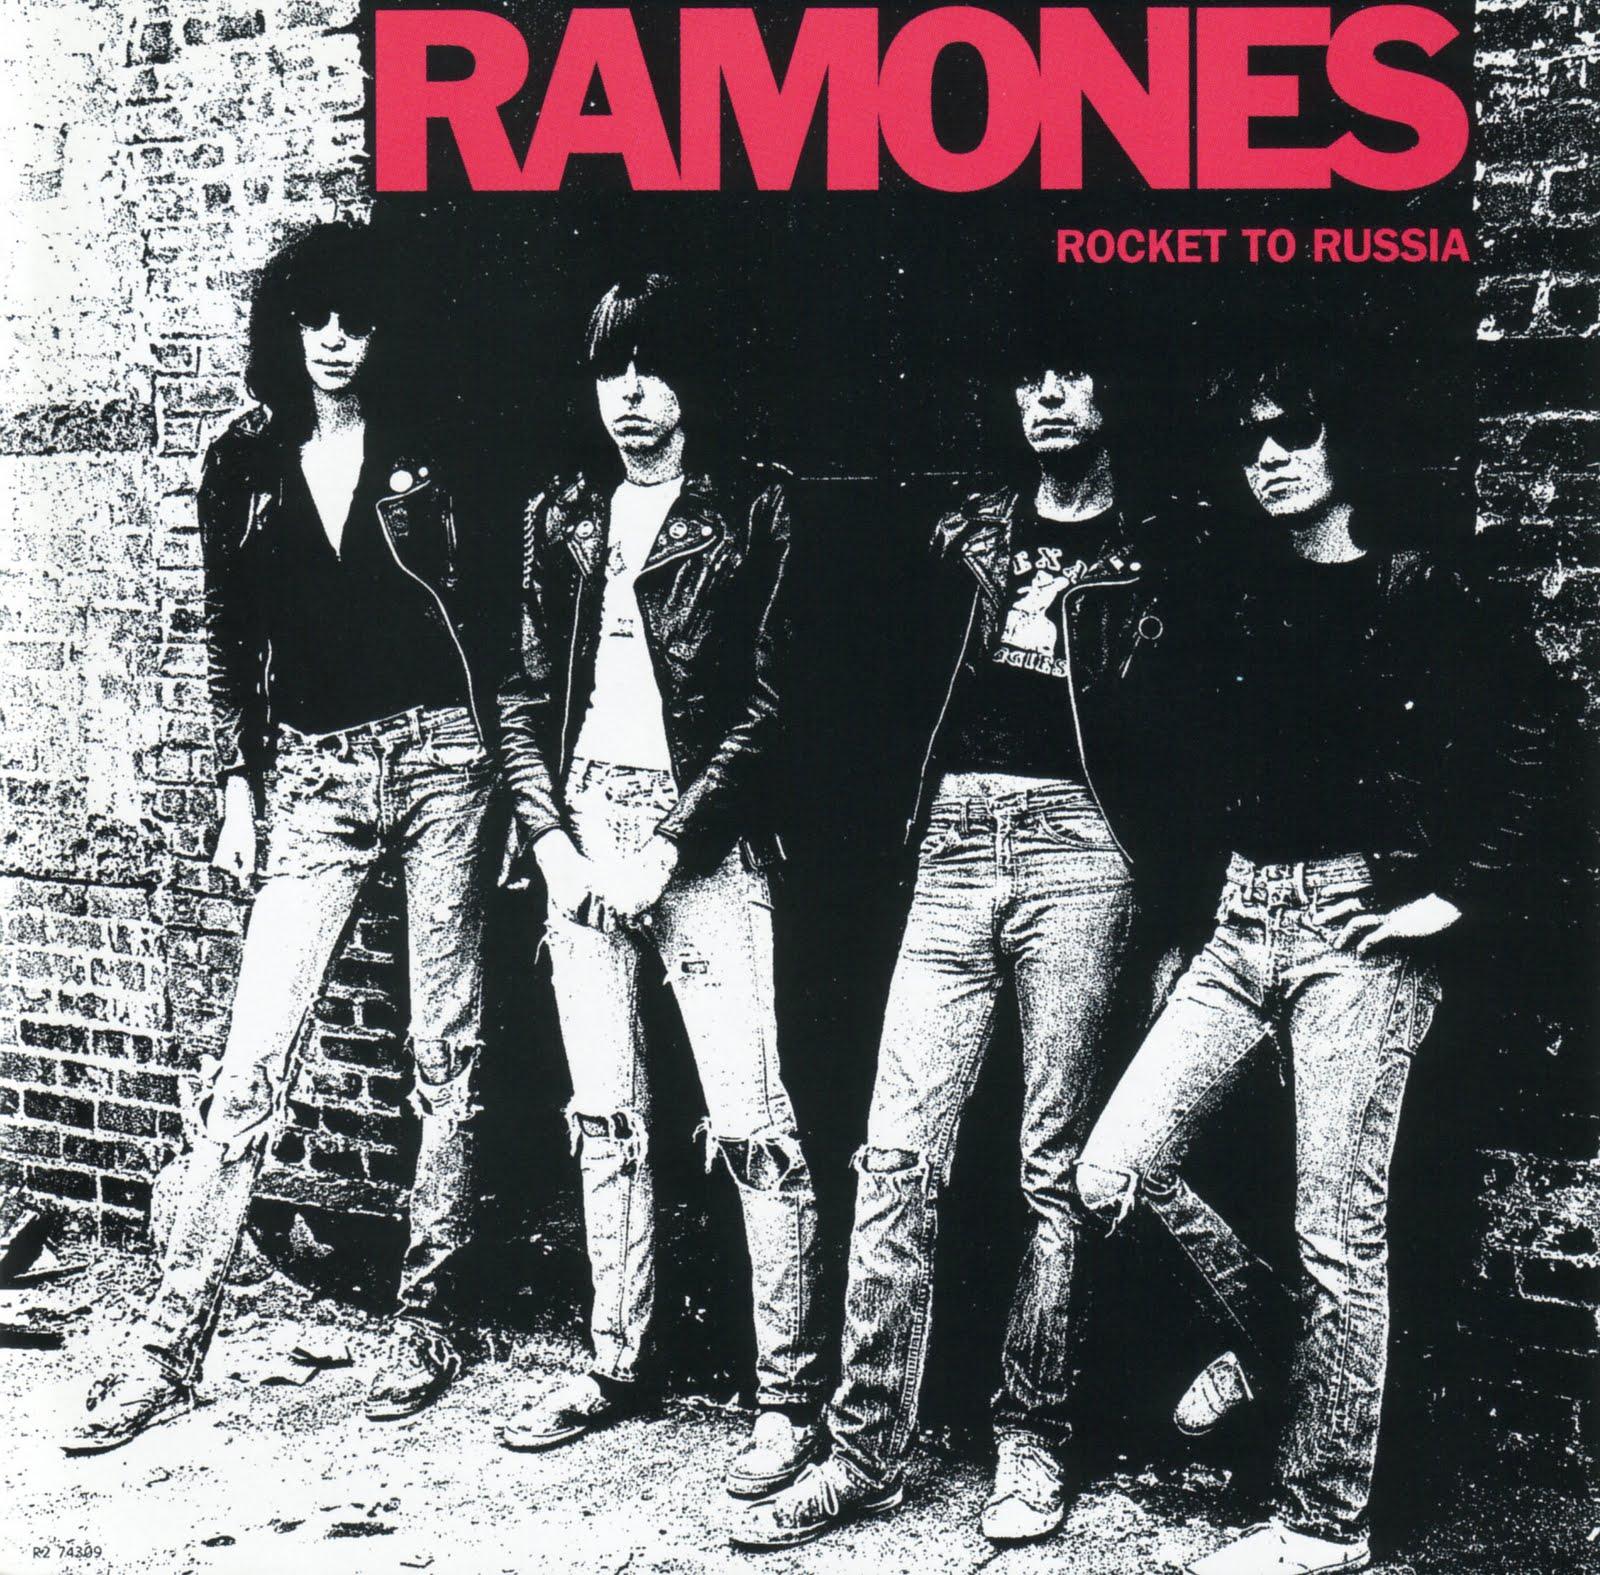 The Ramones - Rocket To Russia (CD) (Full Album)